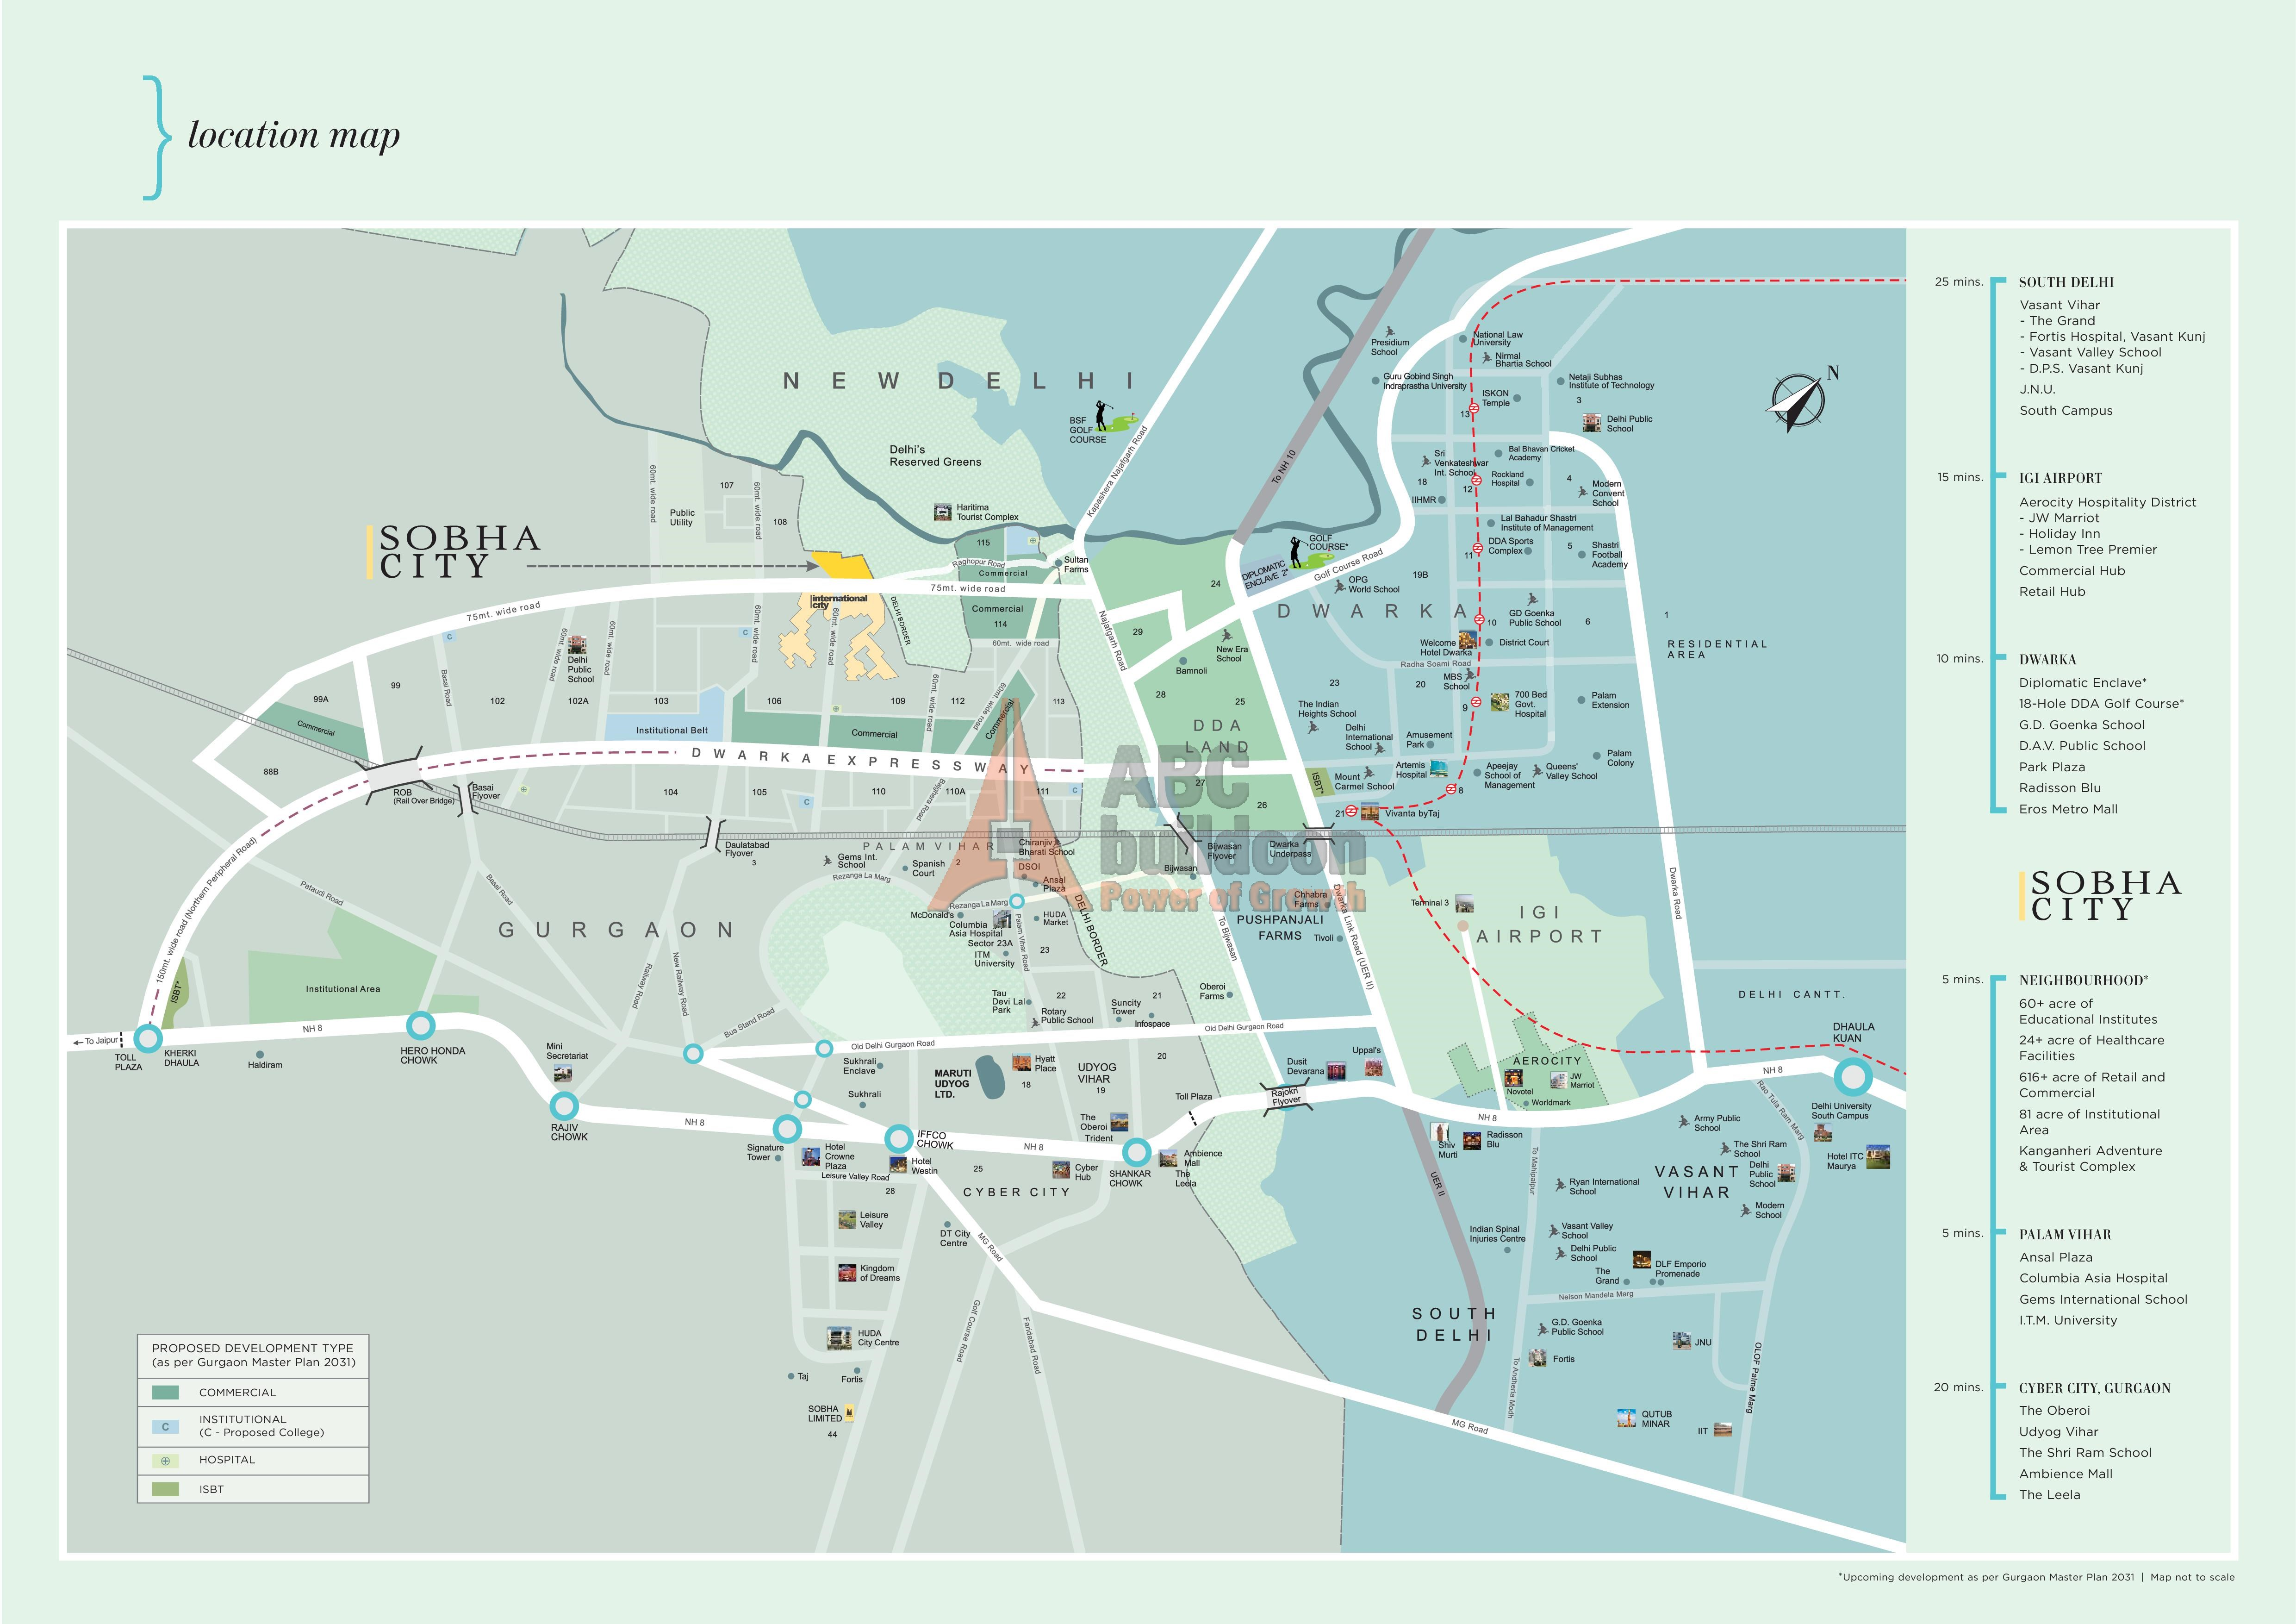 Sobha City Of Location Map